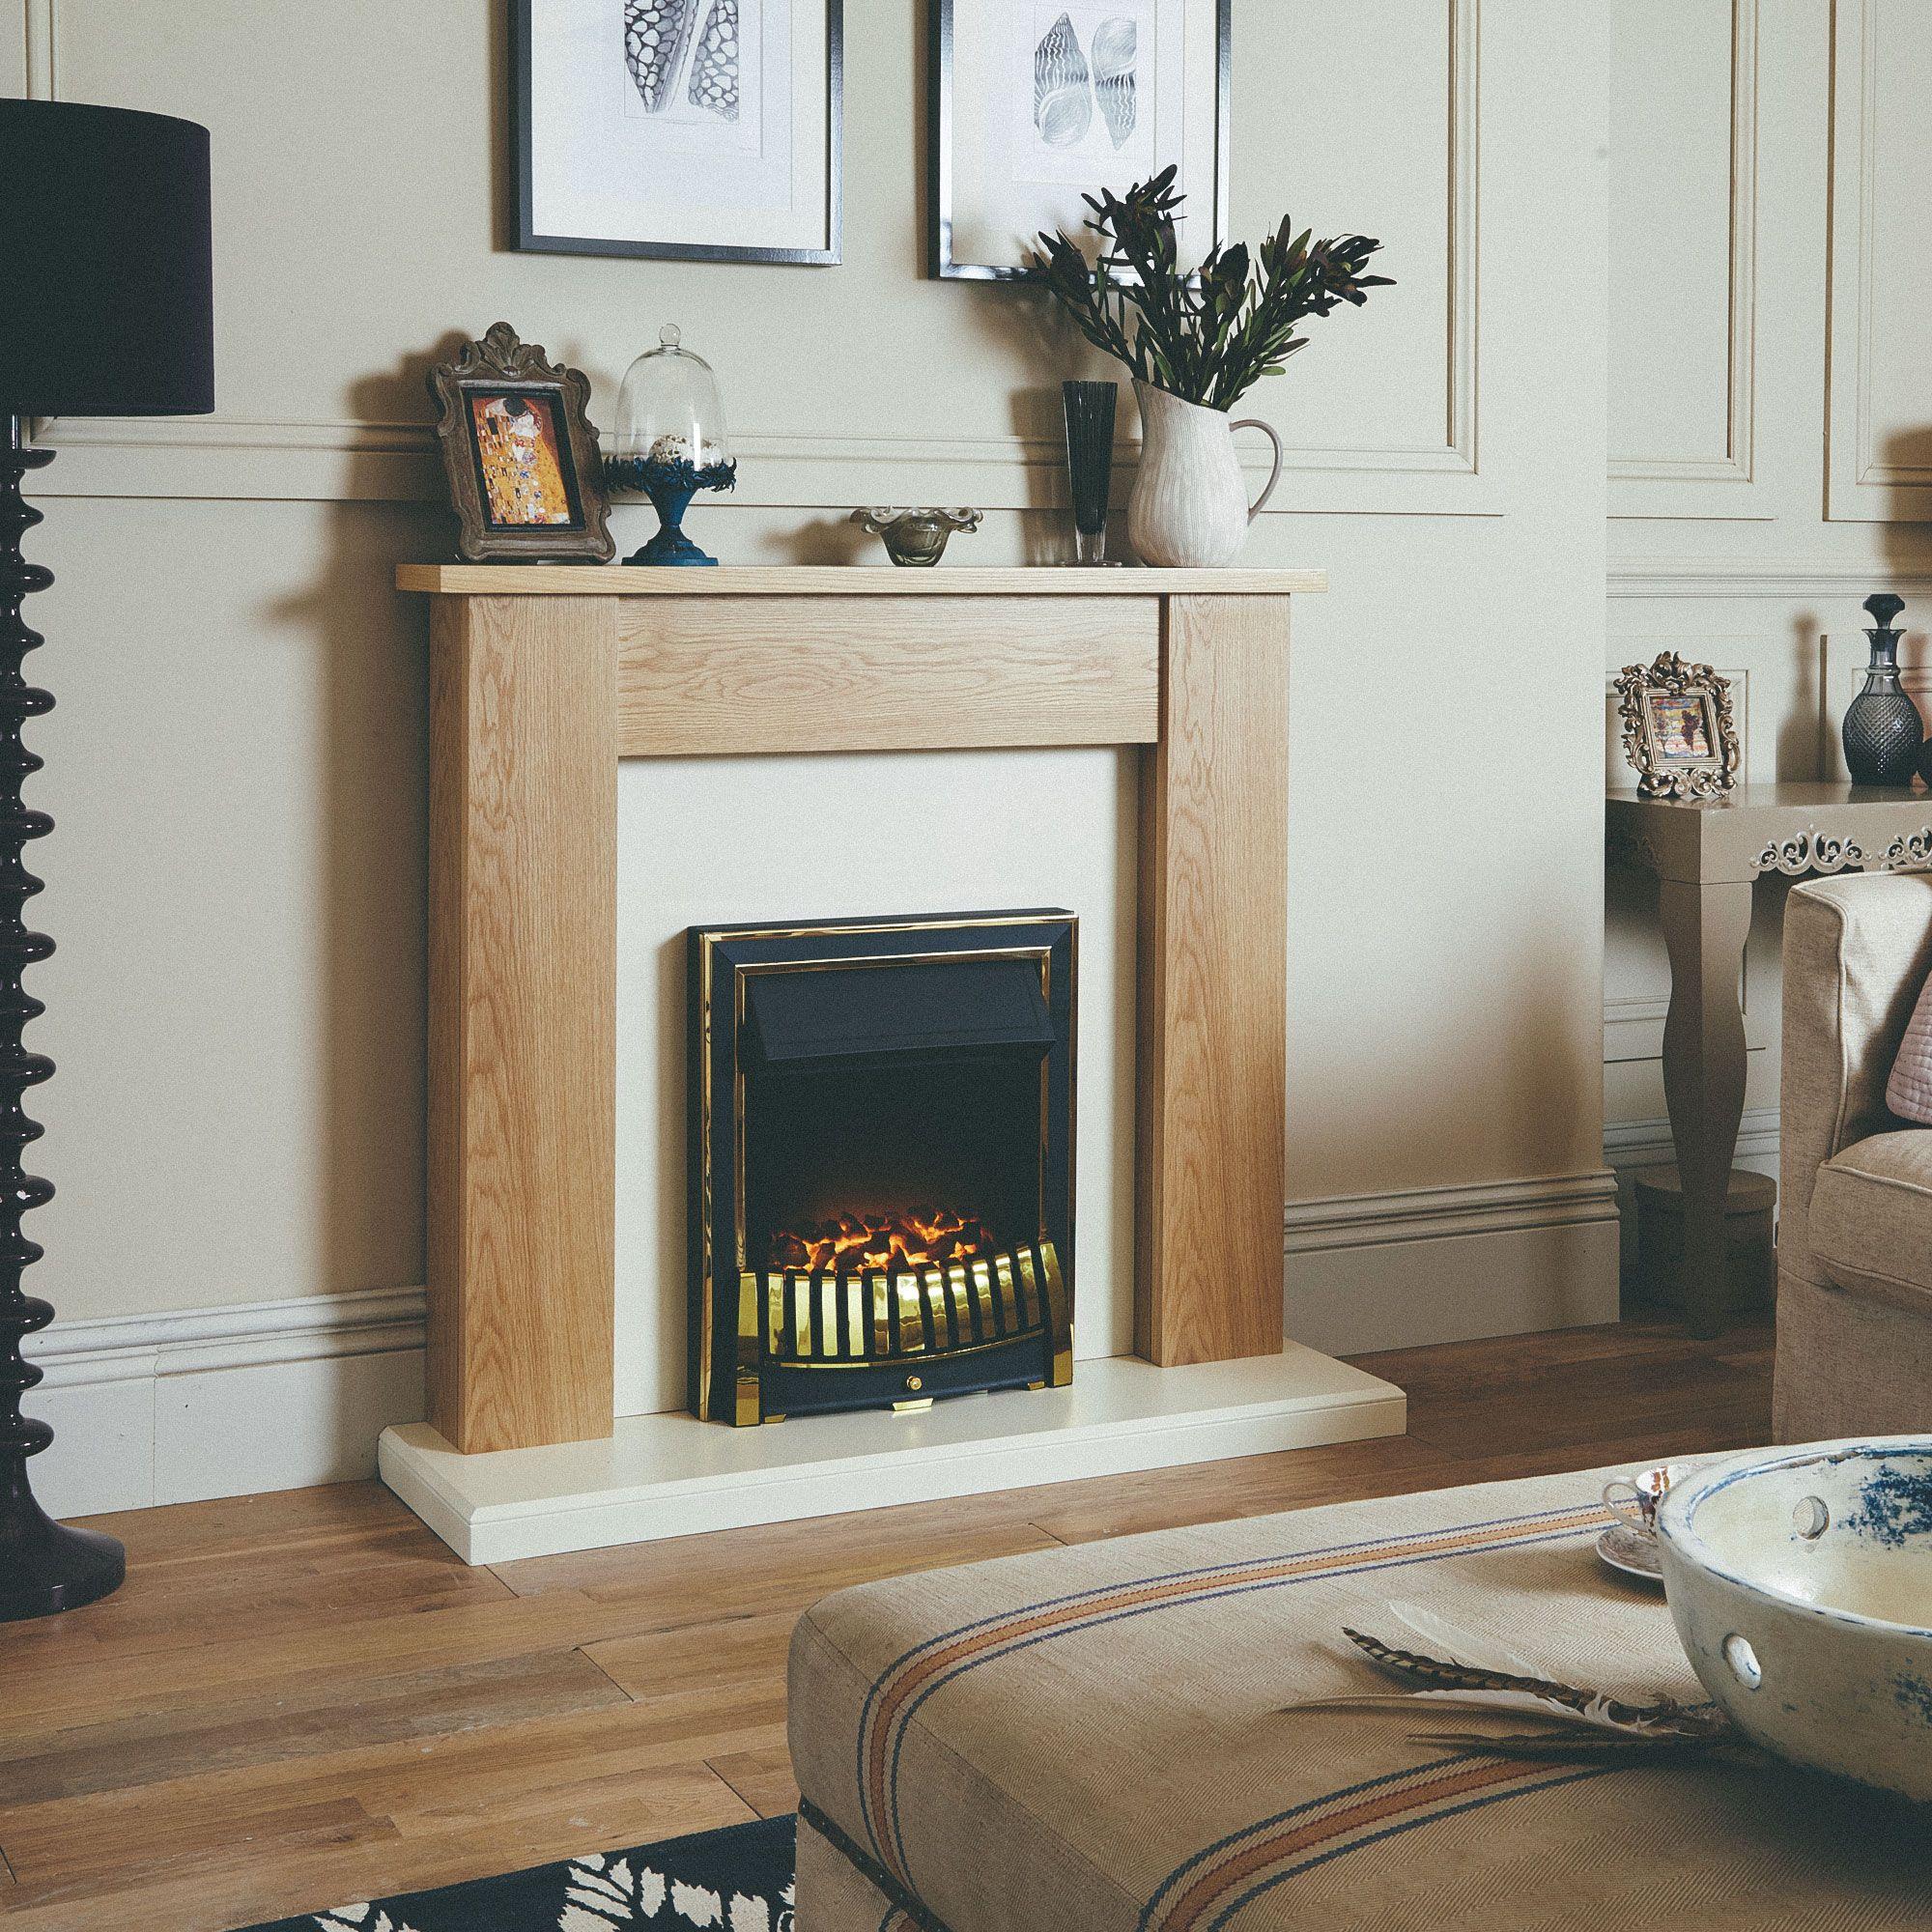 adam sutton fireplace suite in cream with blenheim electric fire